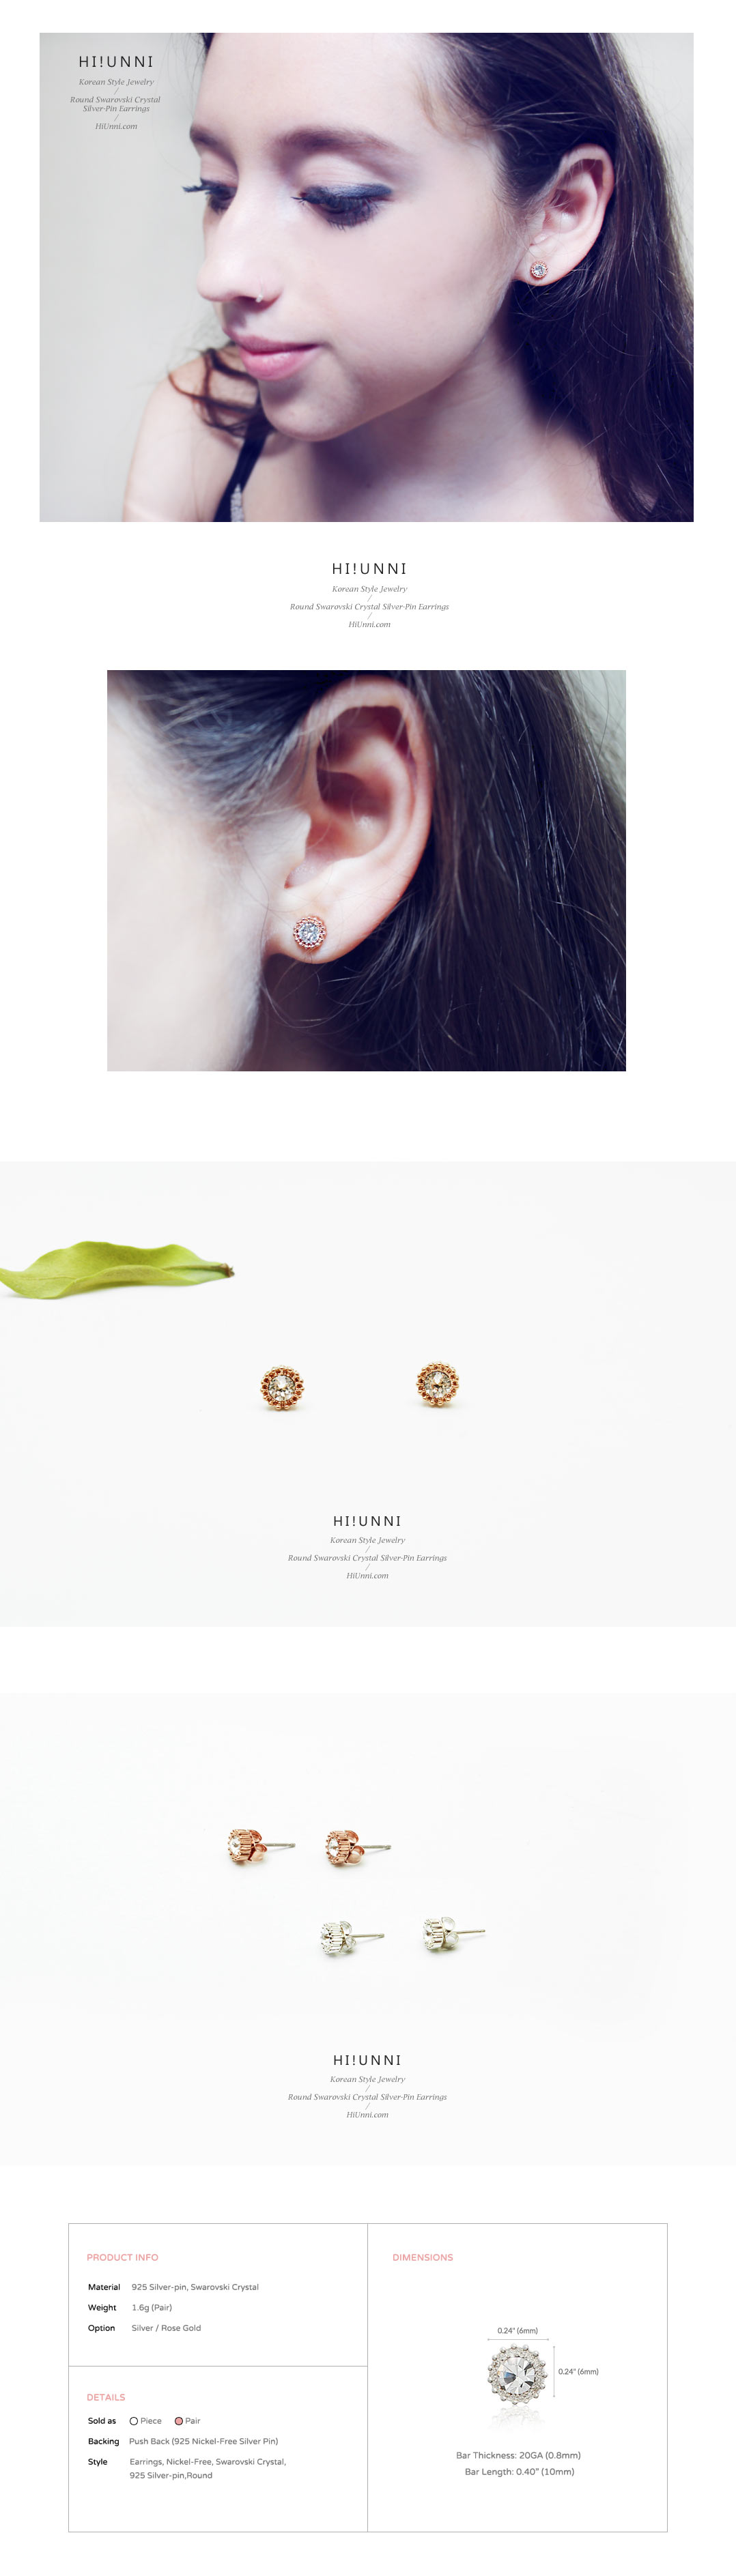 accessories_ear_stud_earrings_korean_asian_style_jewelry_Nickel-Free_titanium_swarovski-_crystal_round_925_silver_5